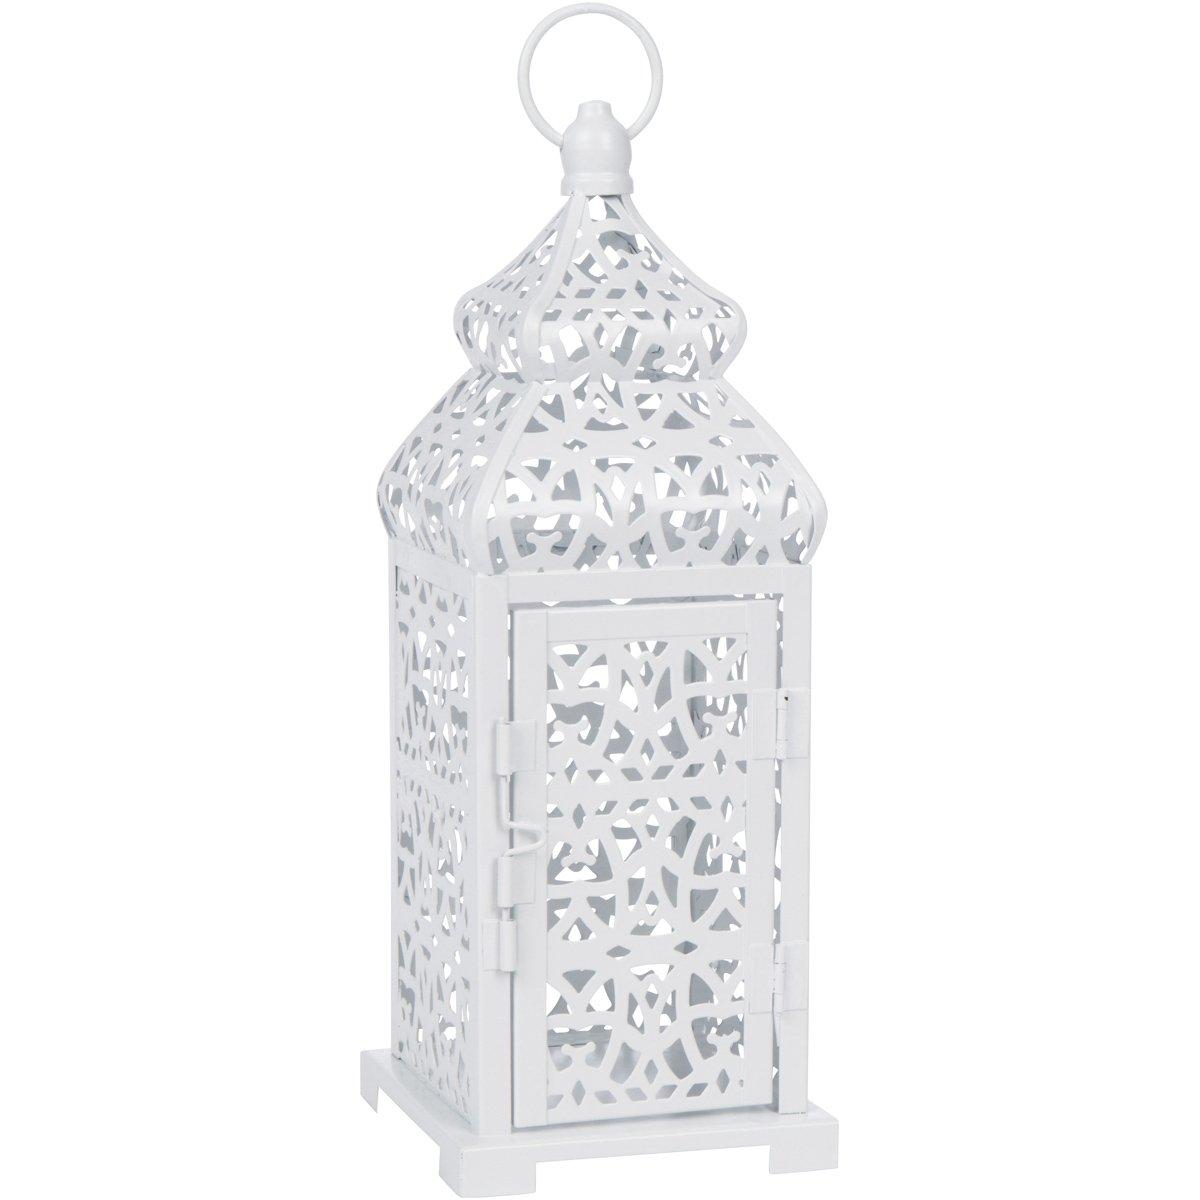 White Temple Moroccan Style Candle Lantern by Vela Lanterns